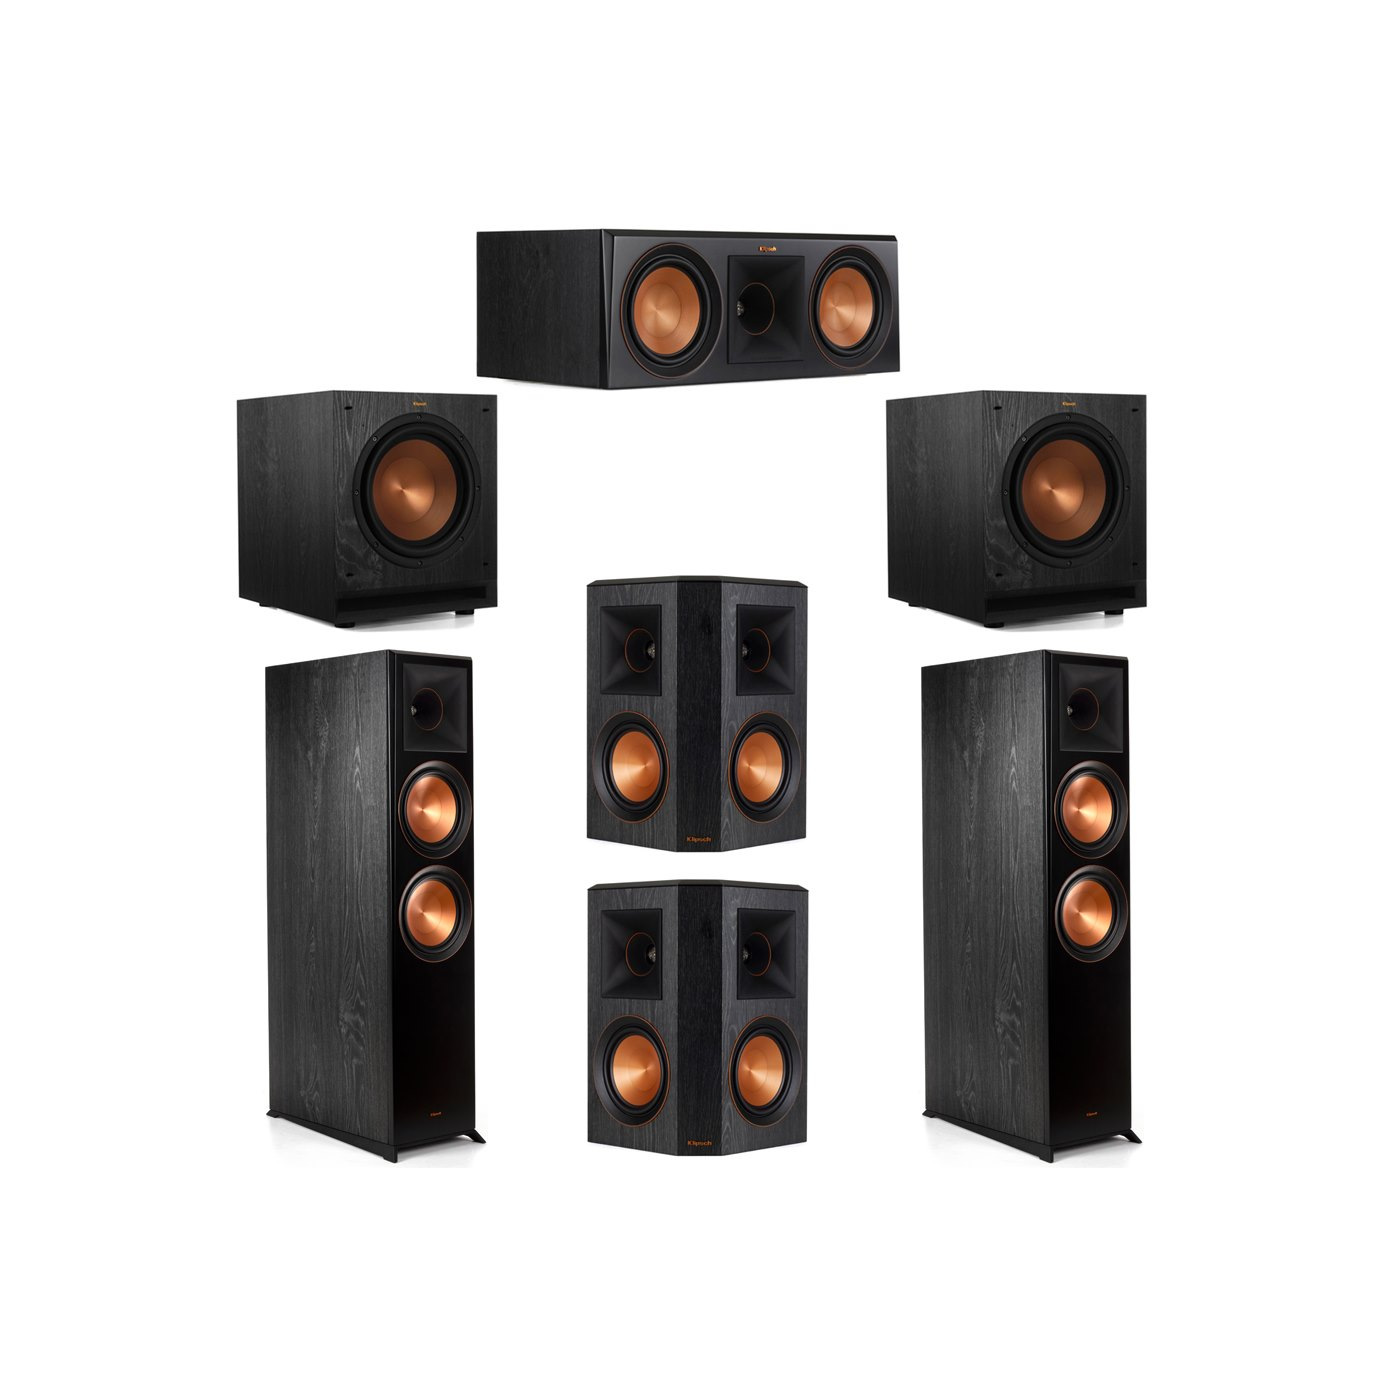 Klipsch 5.2 System with 2 RP-8000F Floorstanding Speakers, 1 Klipsch RP-600C Center Speaker, 2 Klipsch RP-502S Surround Speakers, 2 Klipsch SPL-100 Subwoofers